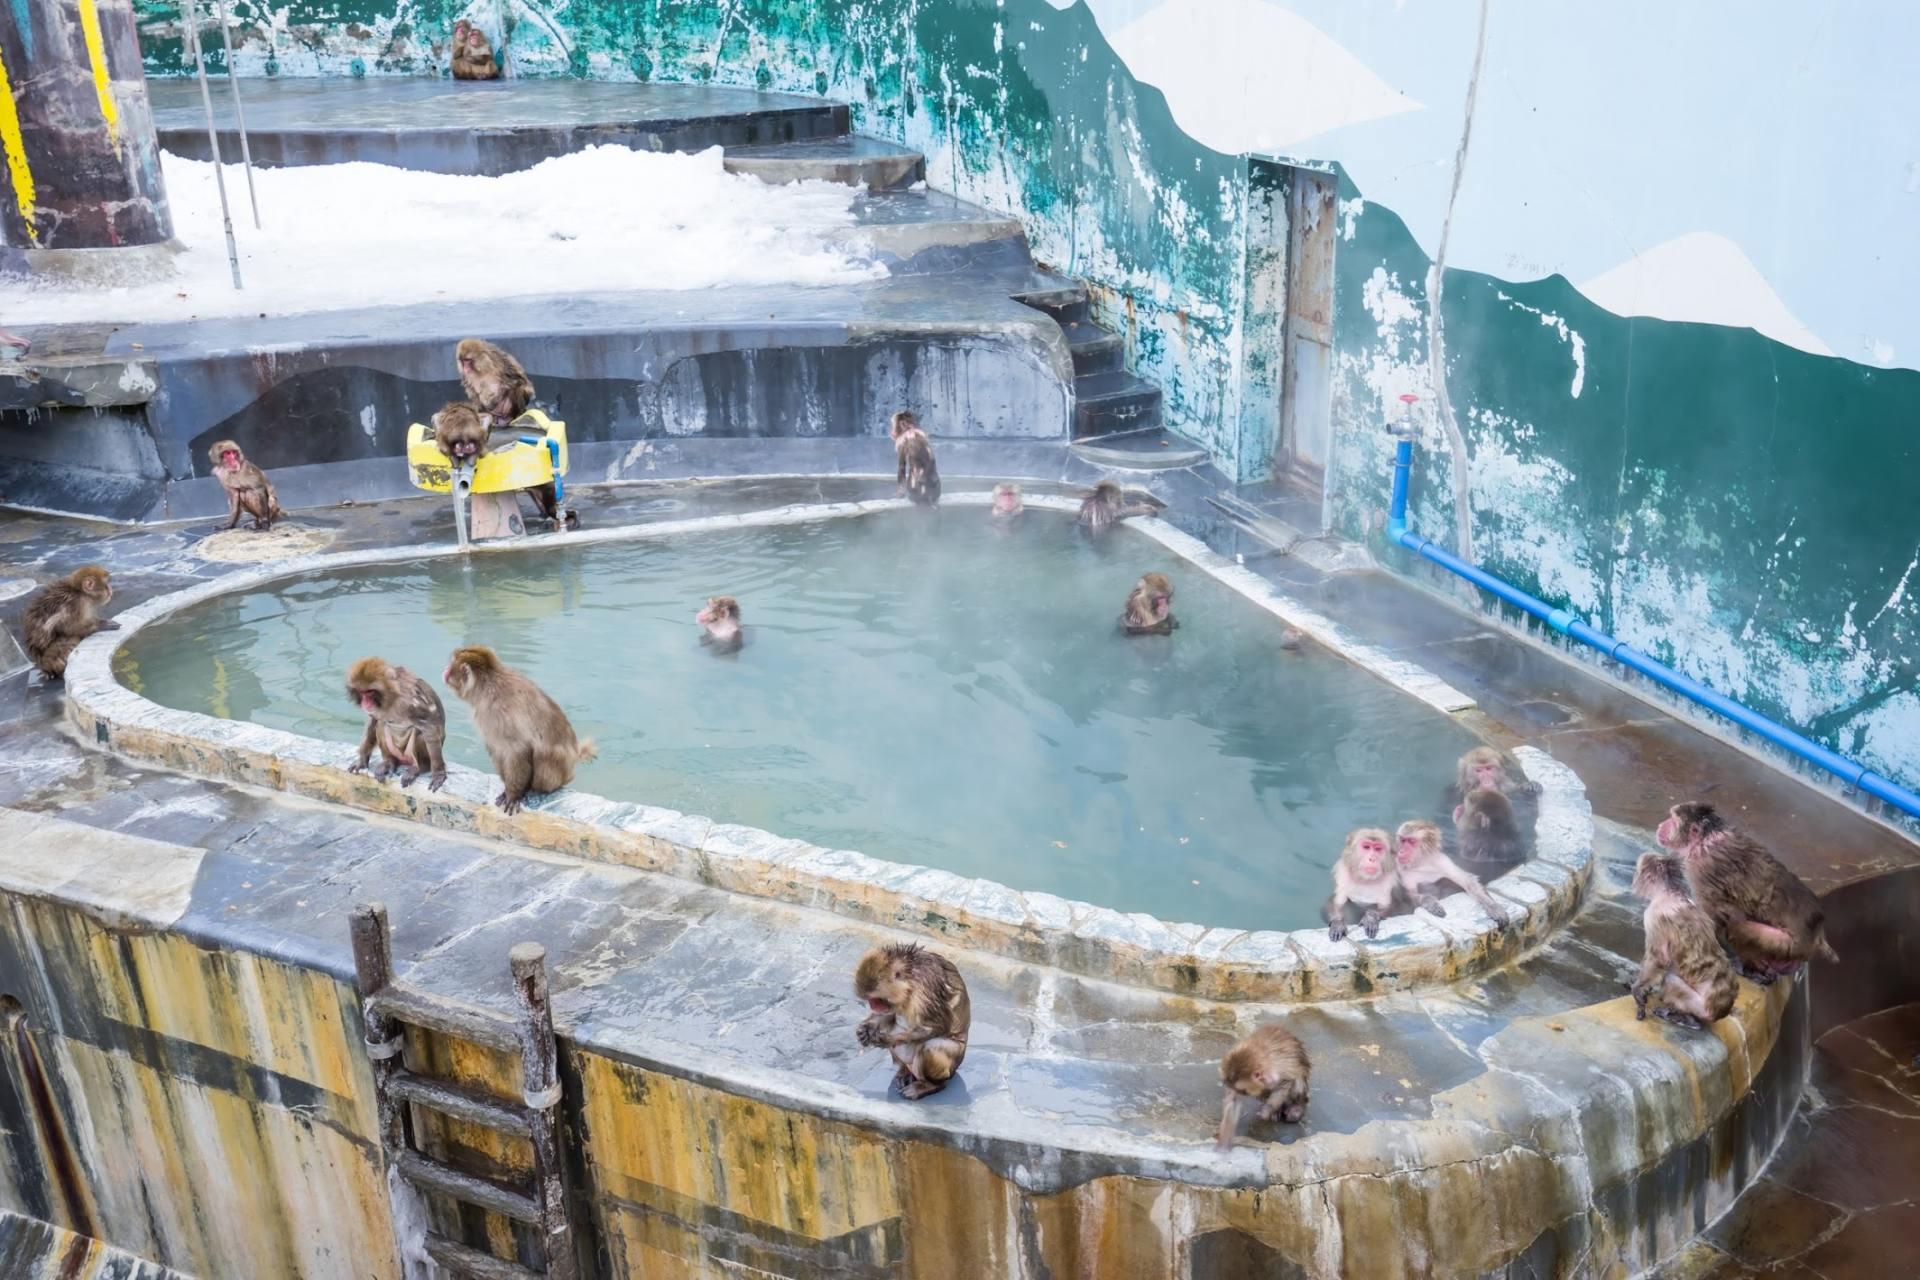 Monkey Hot Springs